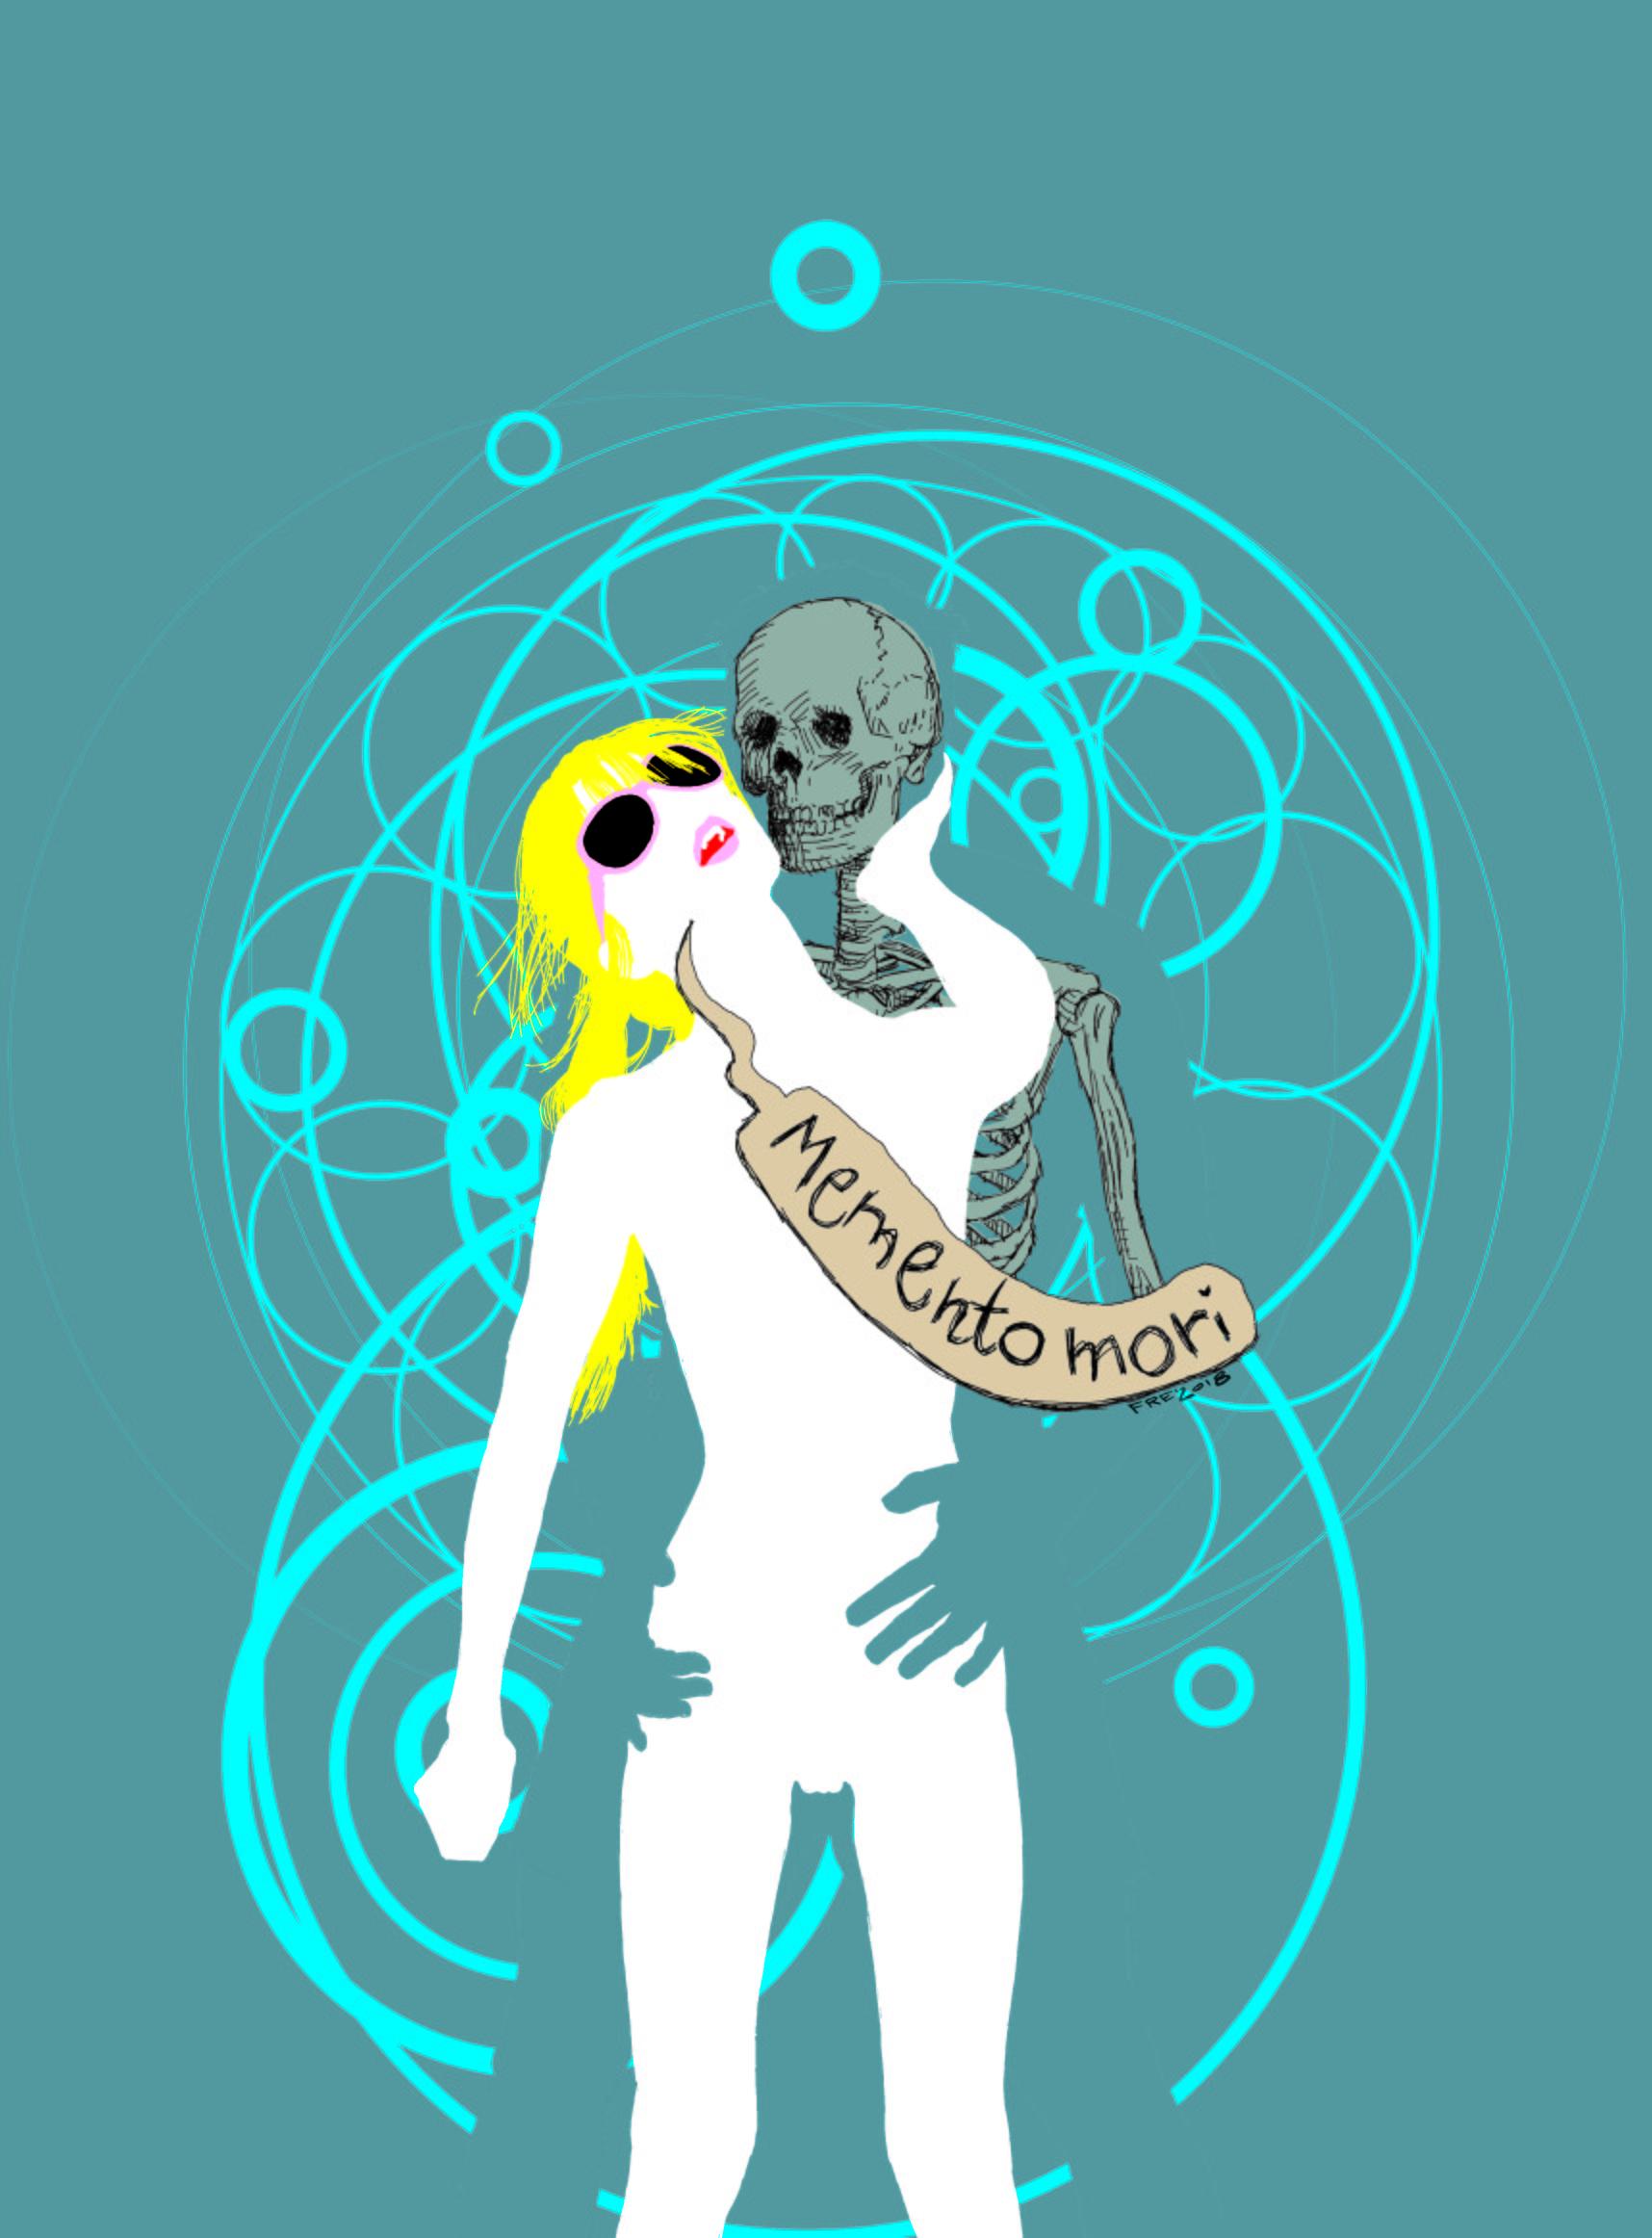 abbraccio con scheletro.jpg